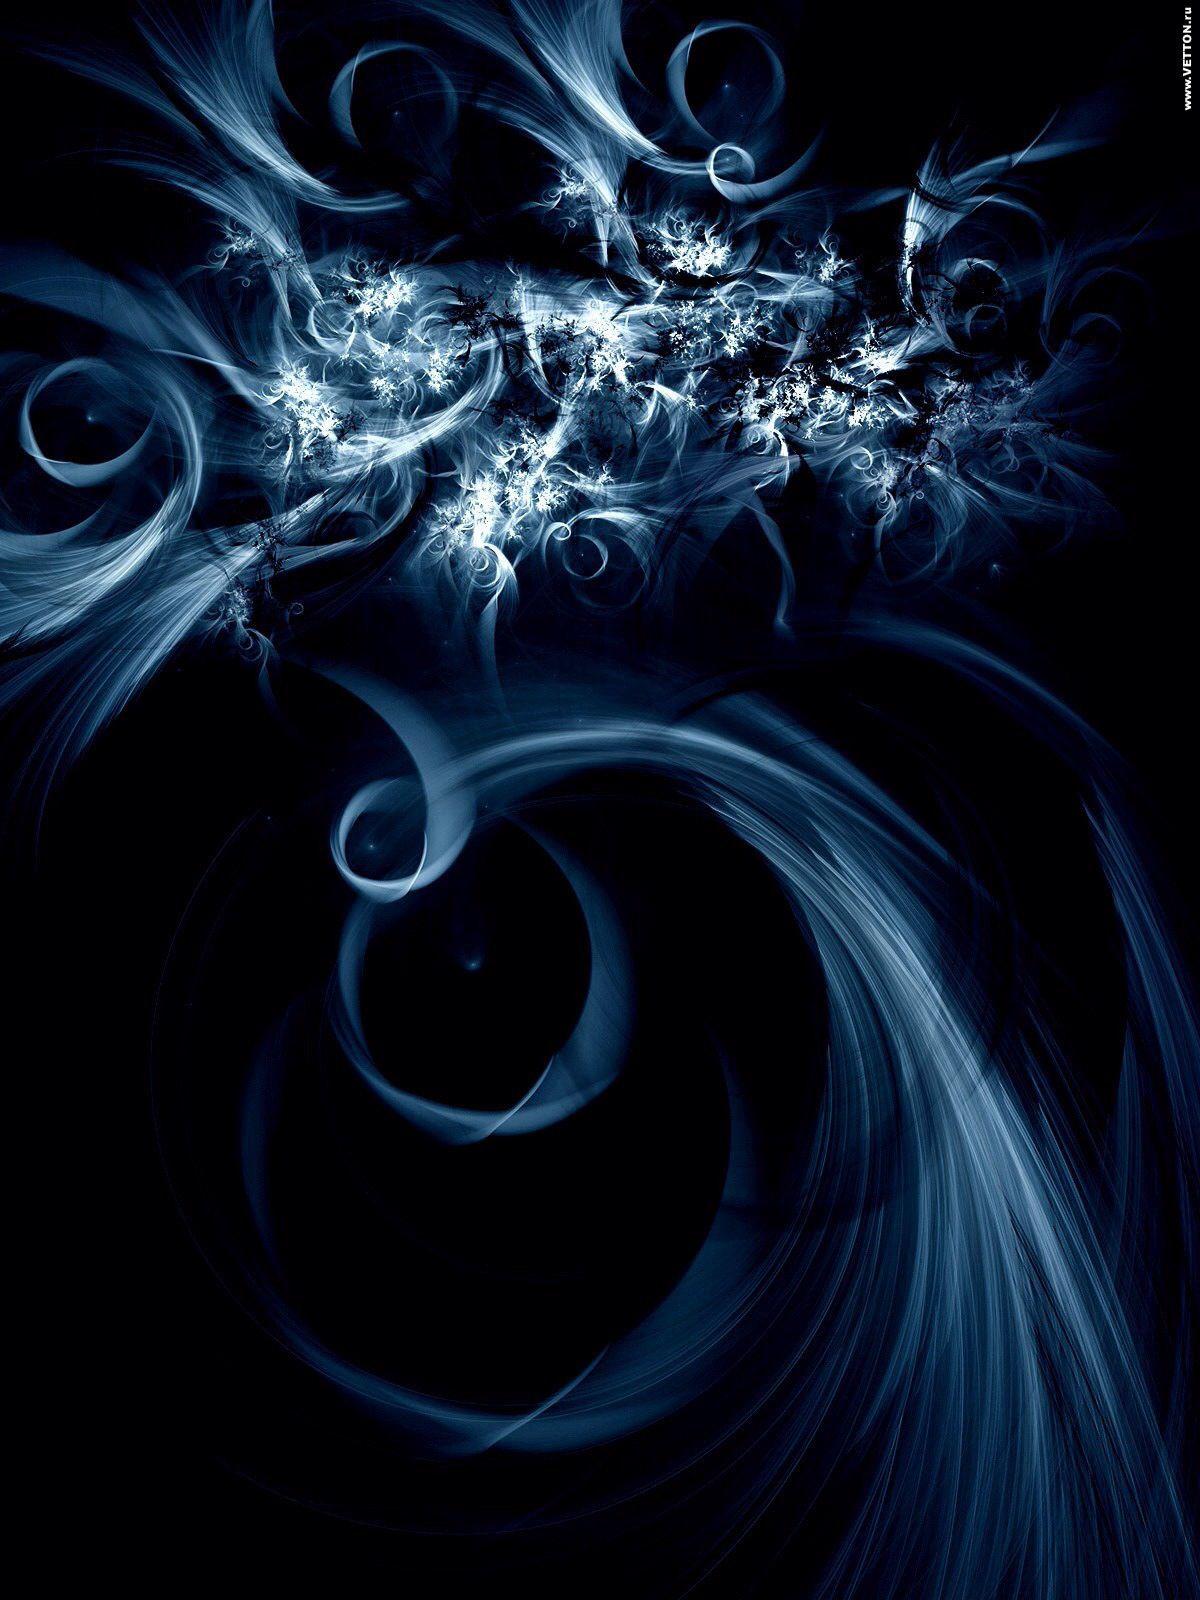 Blue/black wallpaper | Abstract, Wallpaper tree of life ...